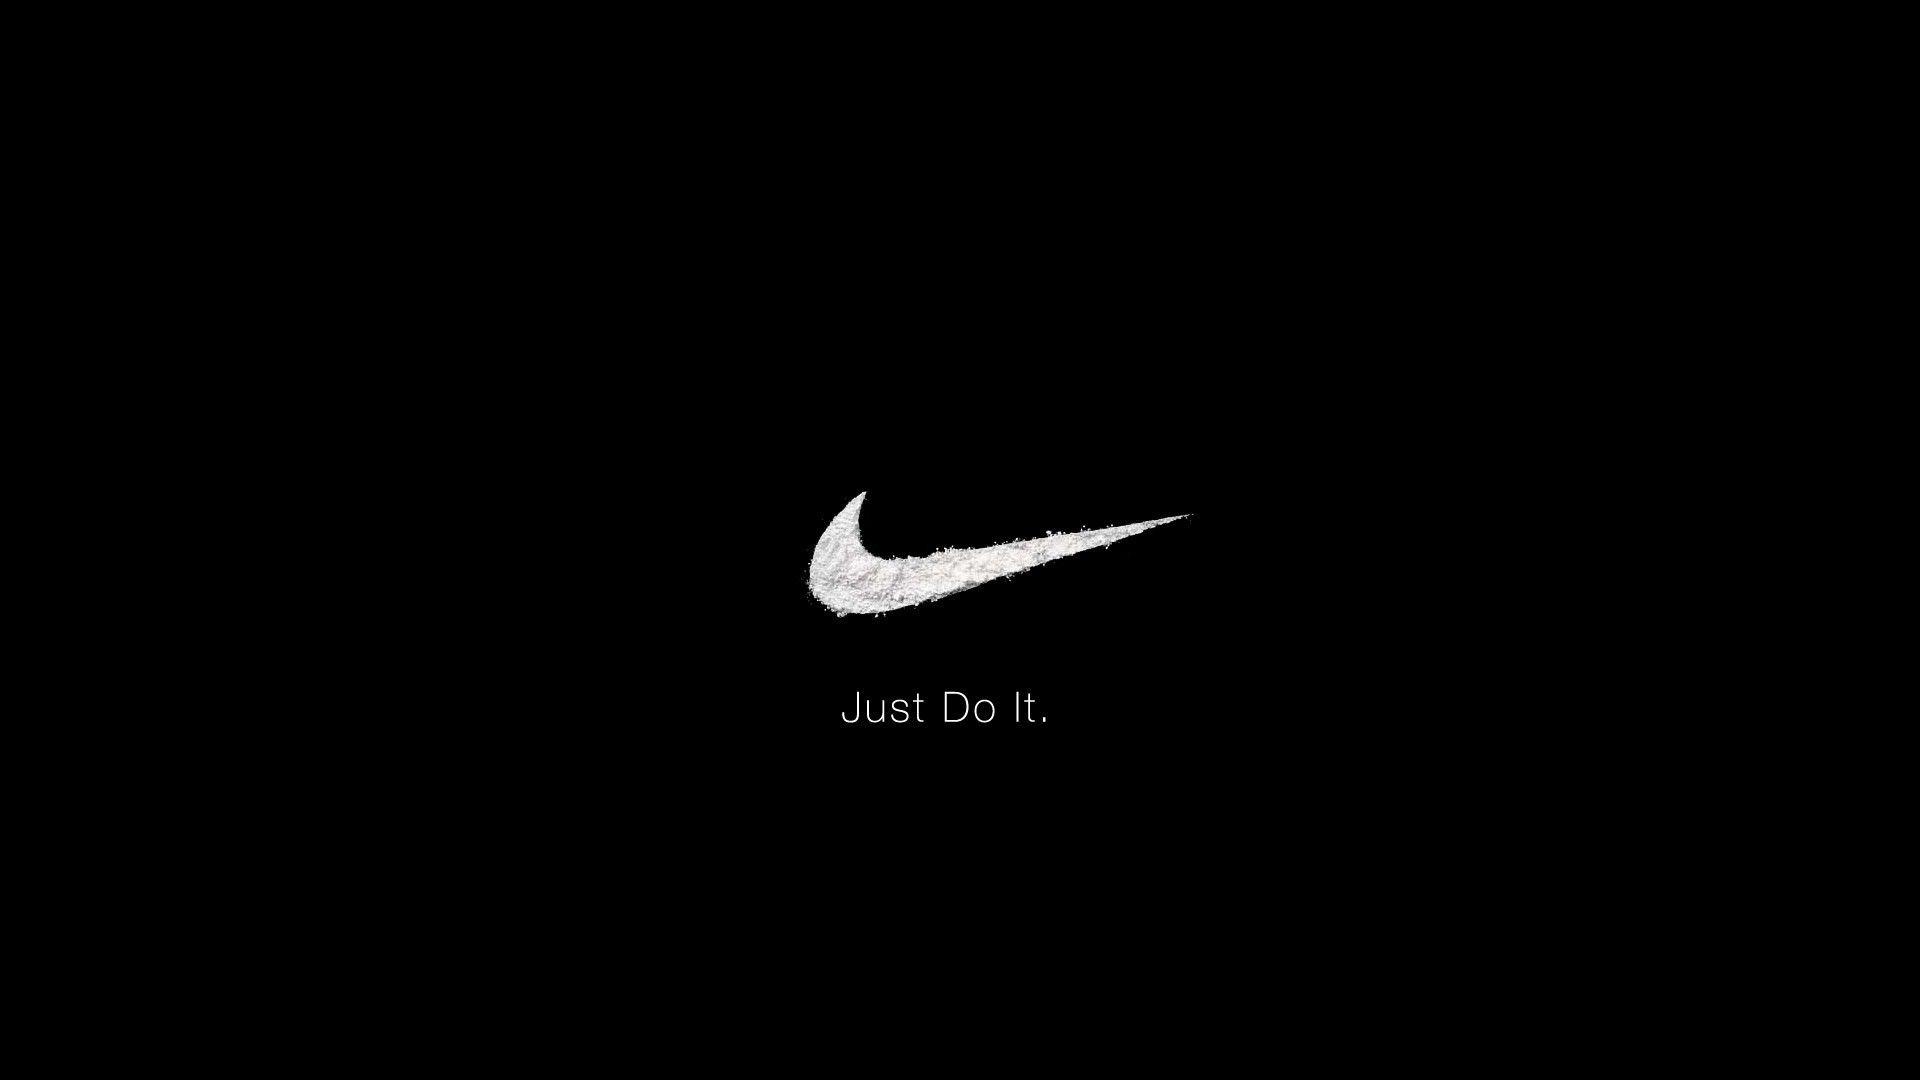 Nike Quote Just Do It Nike Logo Wallpapers Nike Wallpaper Nike Logo